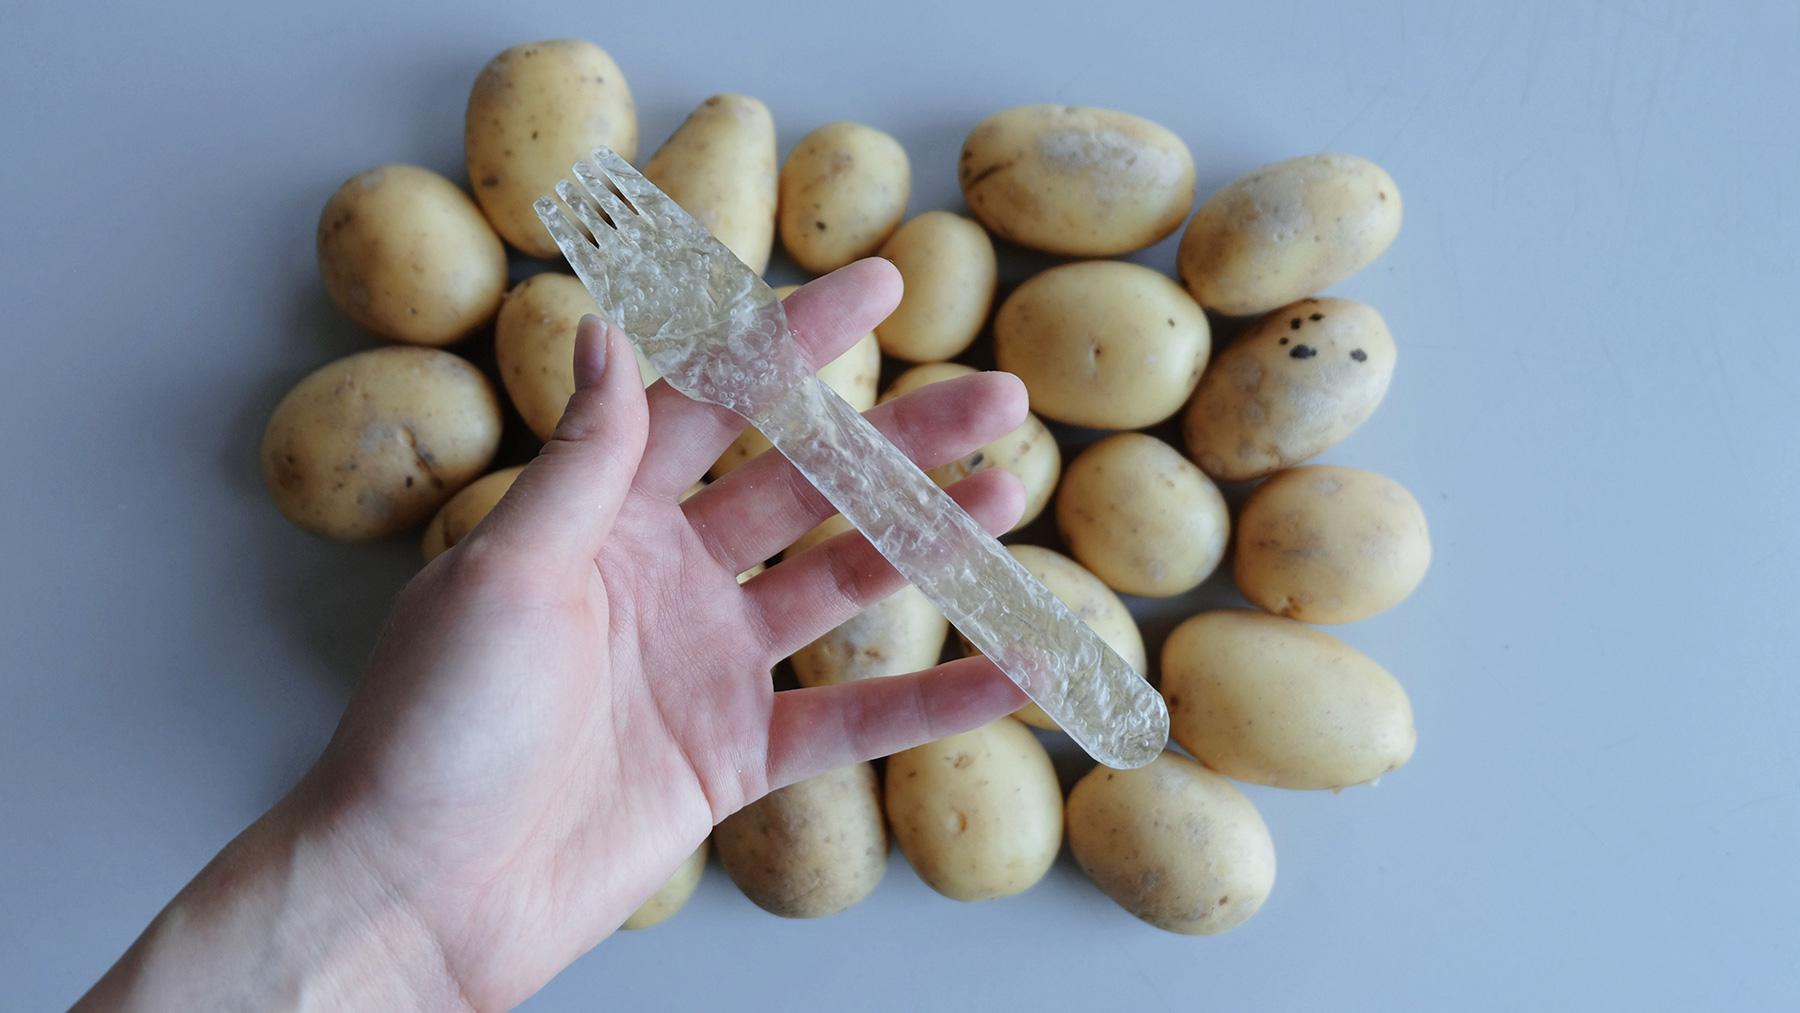 Graphic design game changers: Törnqvist's potato starch cutlery